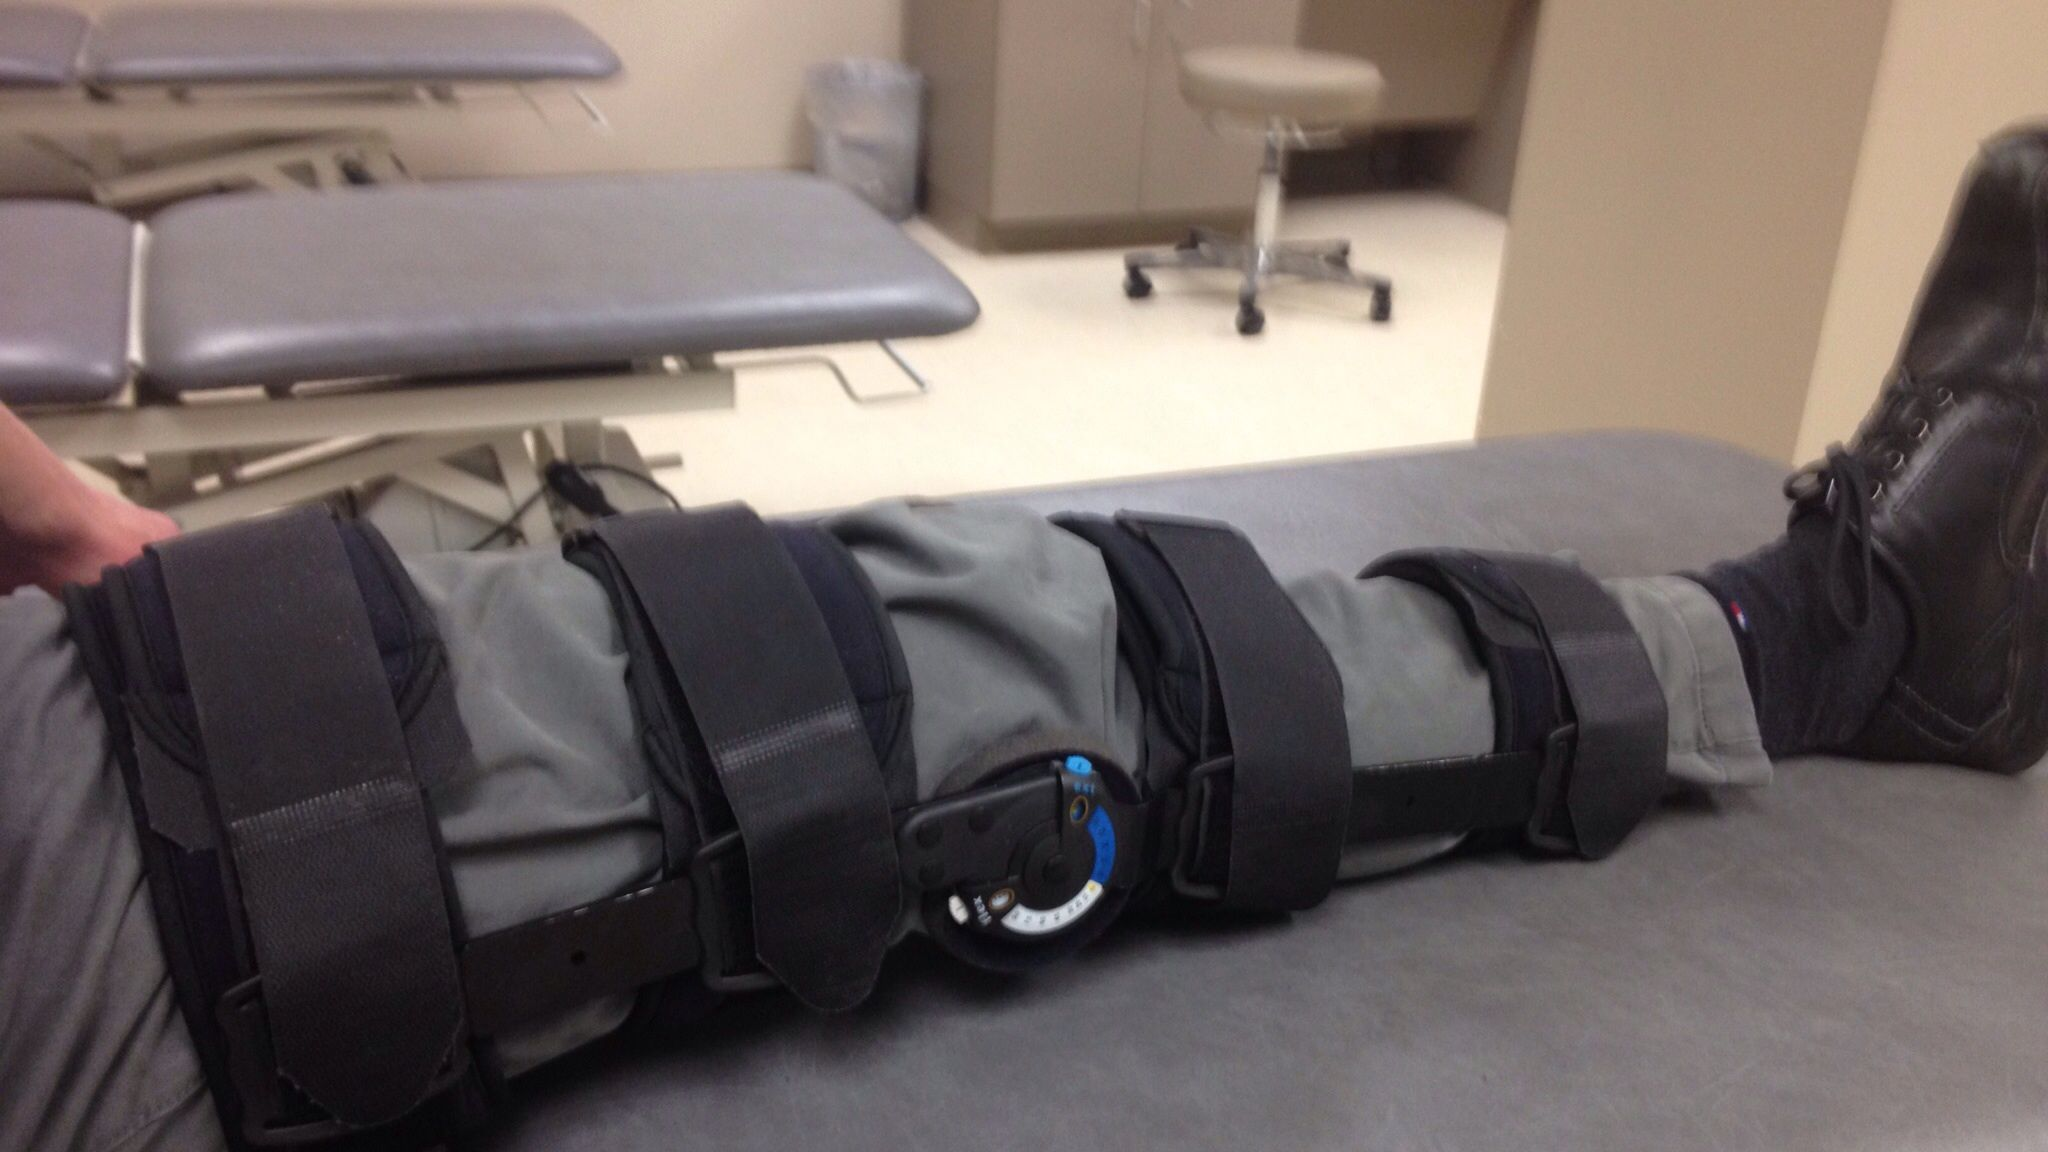 Do I Need to Use a Knee Brace After ACL Surgery?